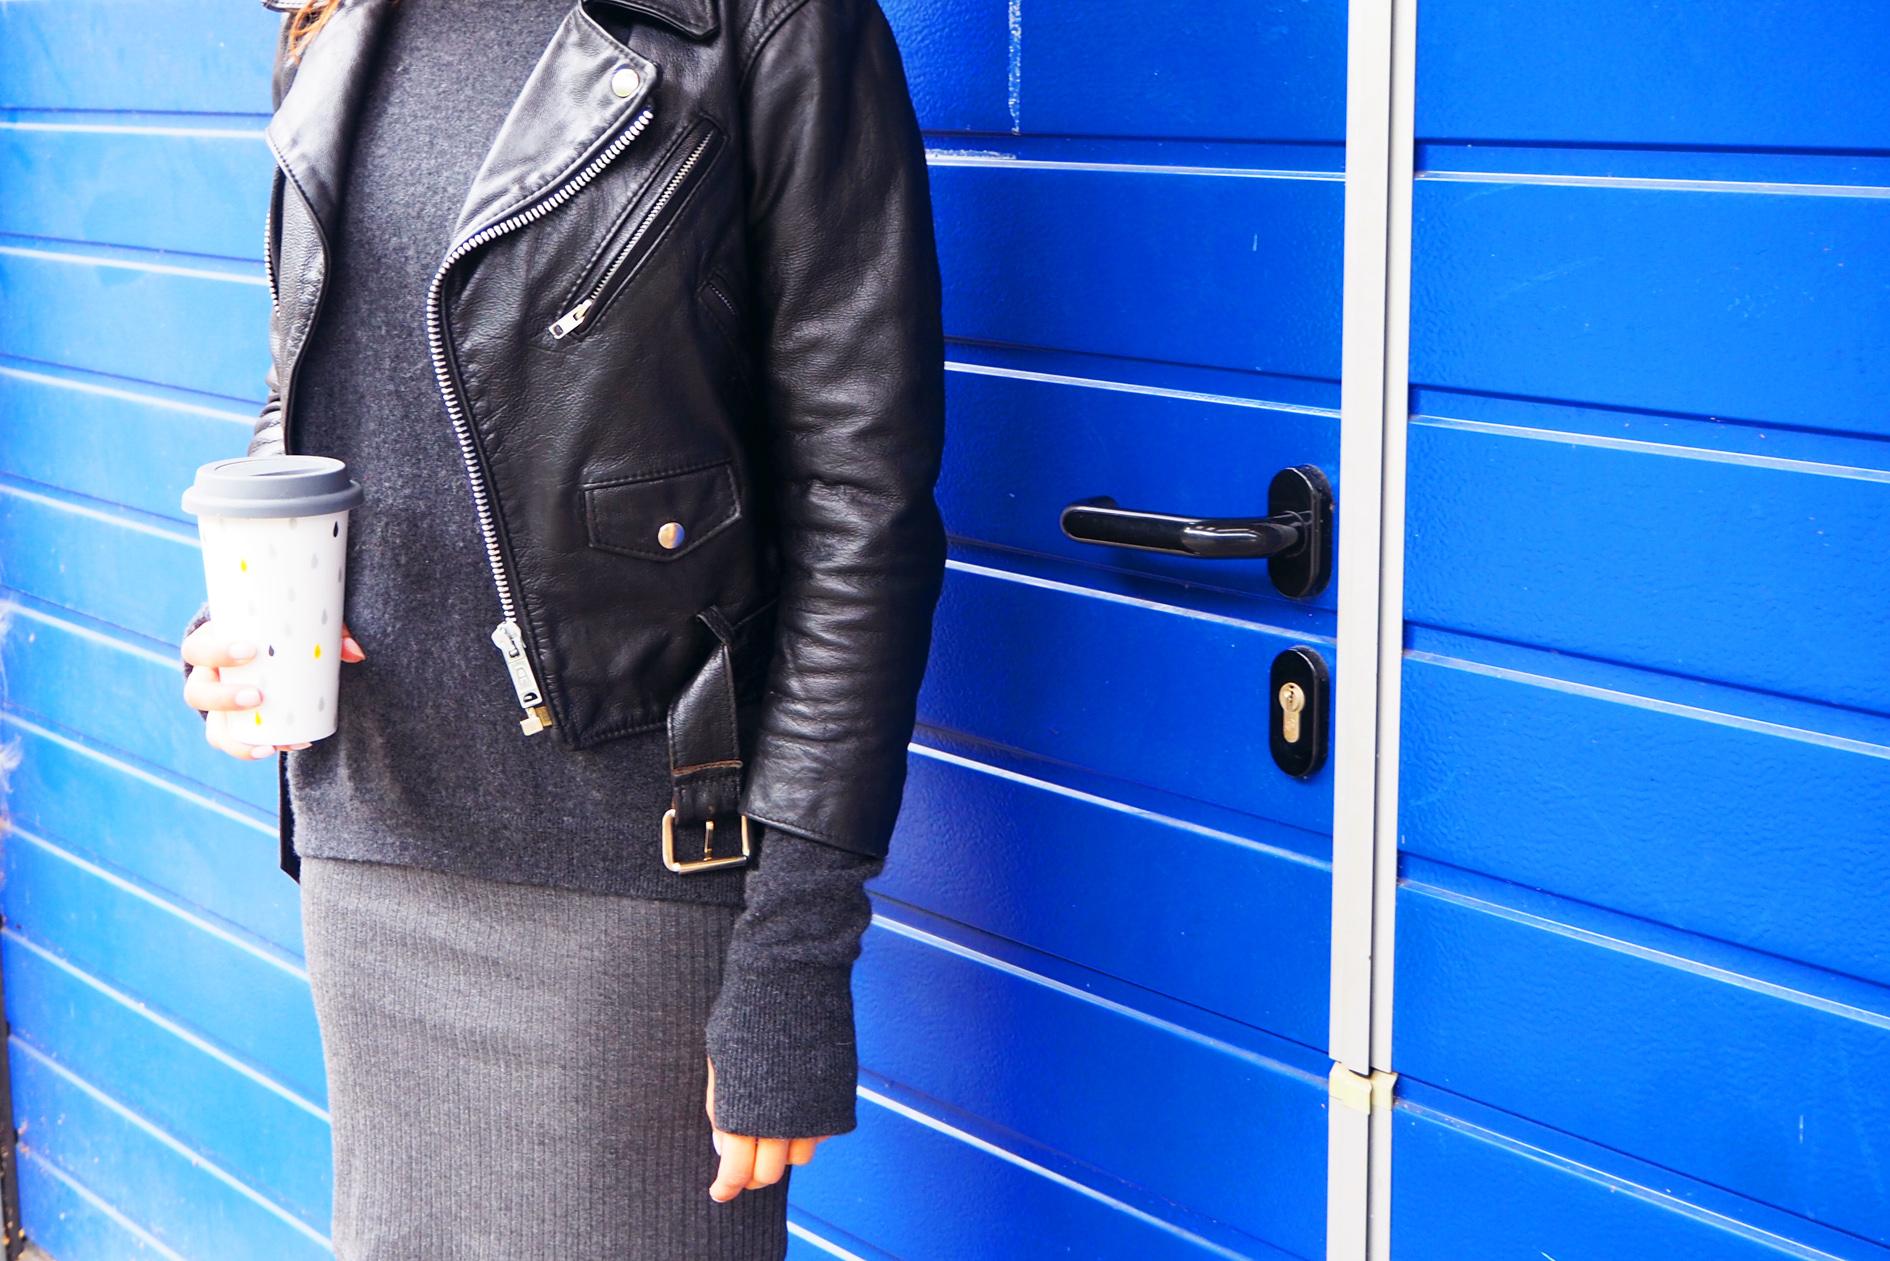 perfecto cuir mode look automne tendances 2016 blogger mode